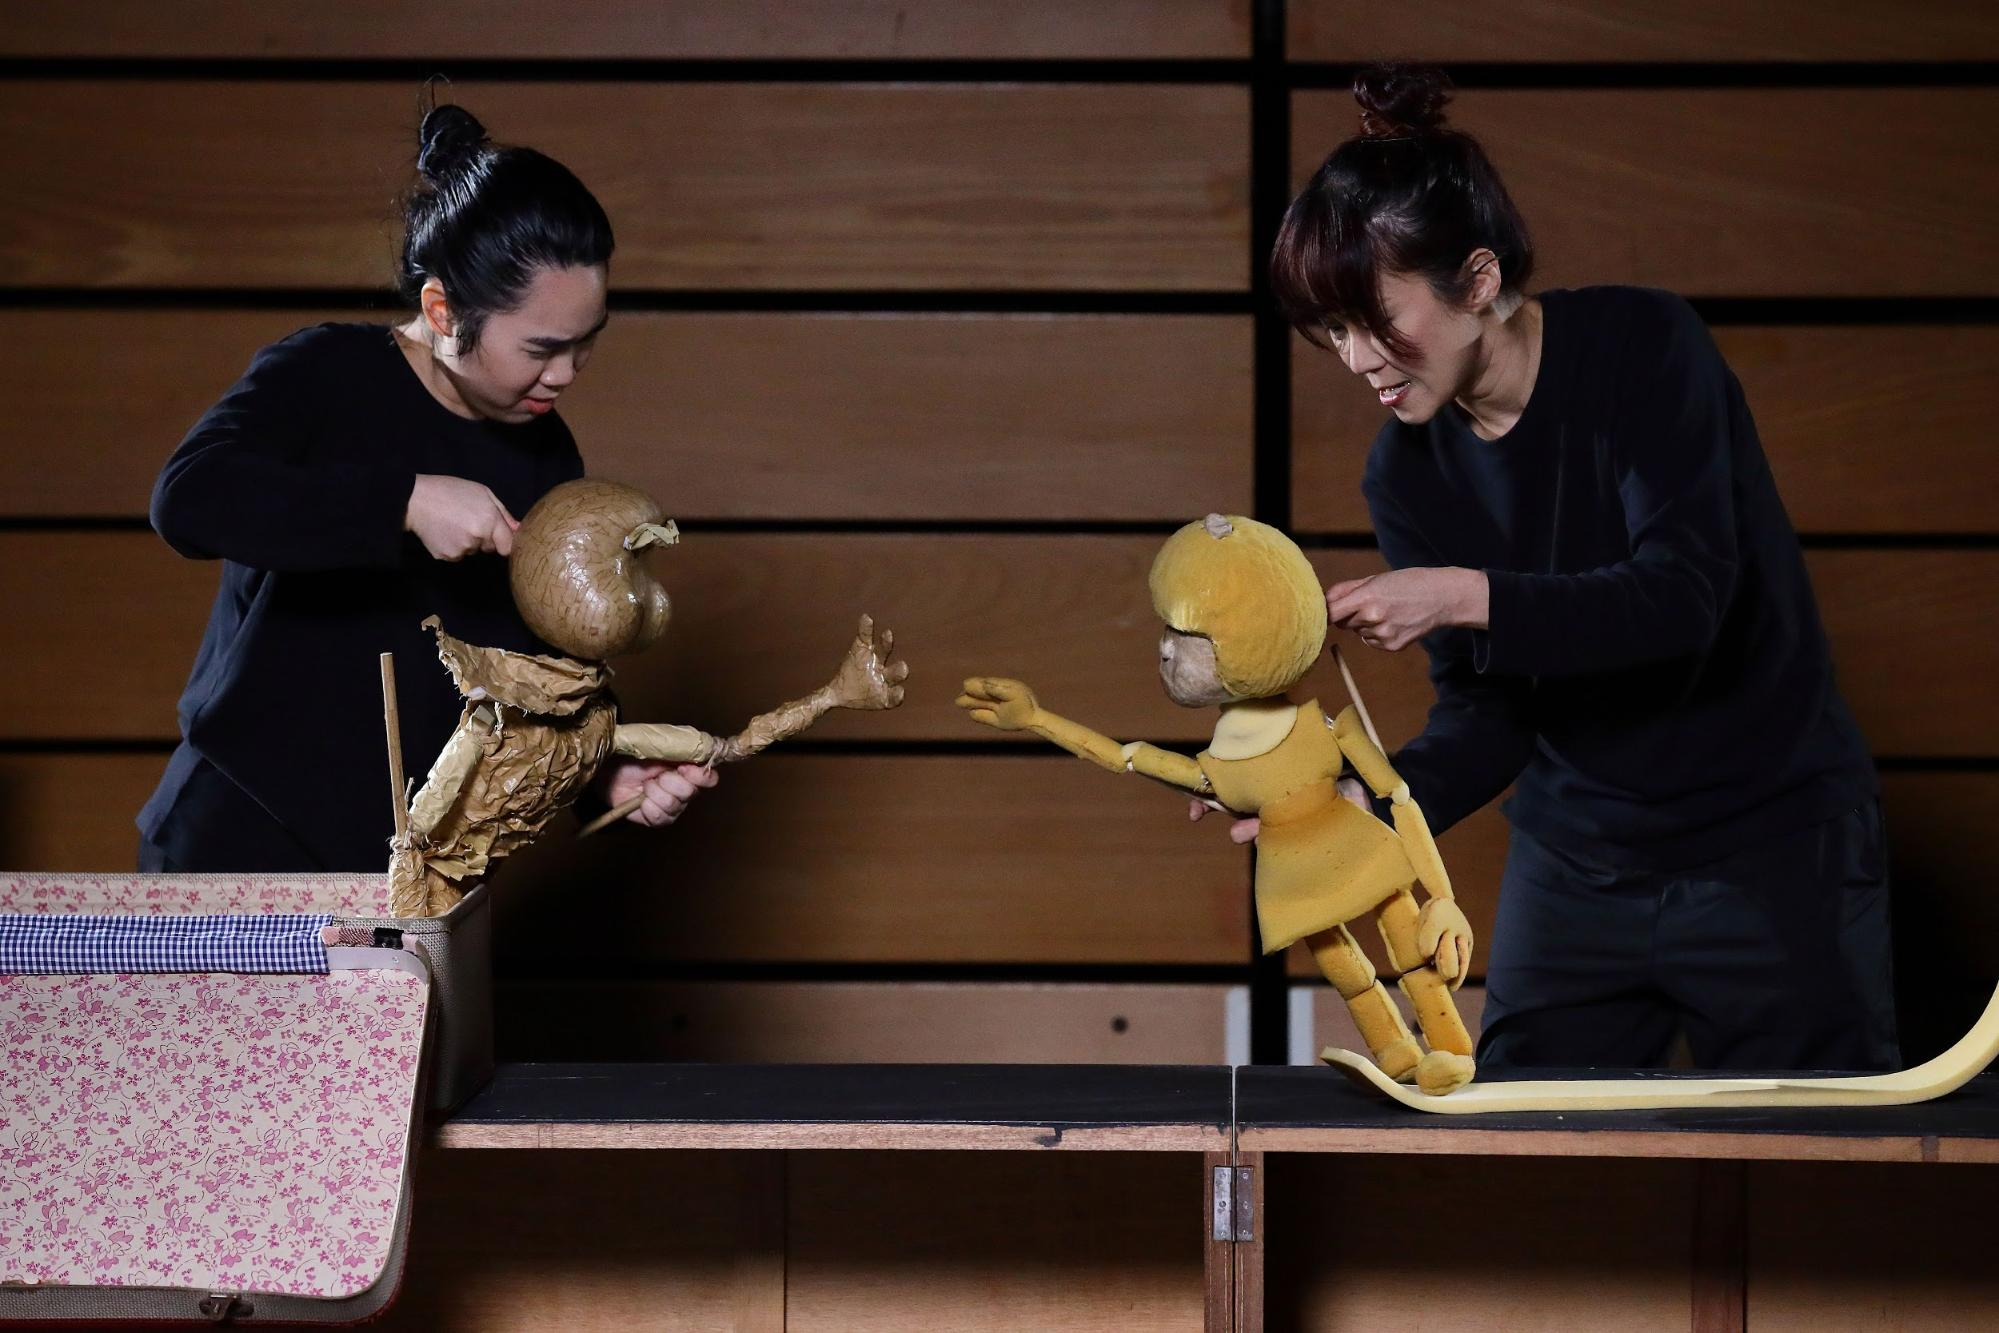 Arts In Your Neighbourhood 2021 - Pasir Ris: The Puppeteer Prepares